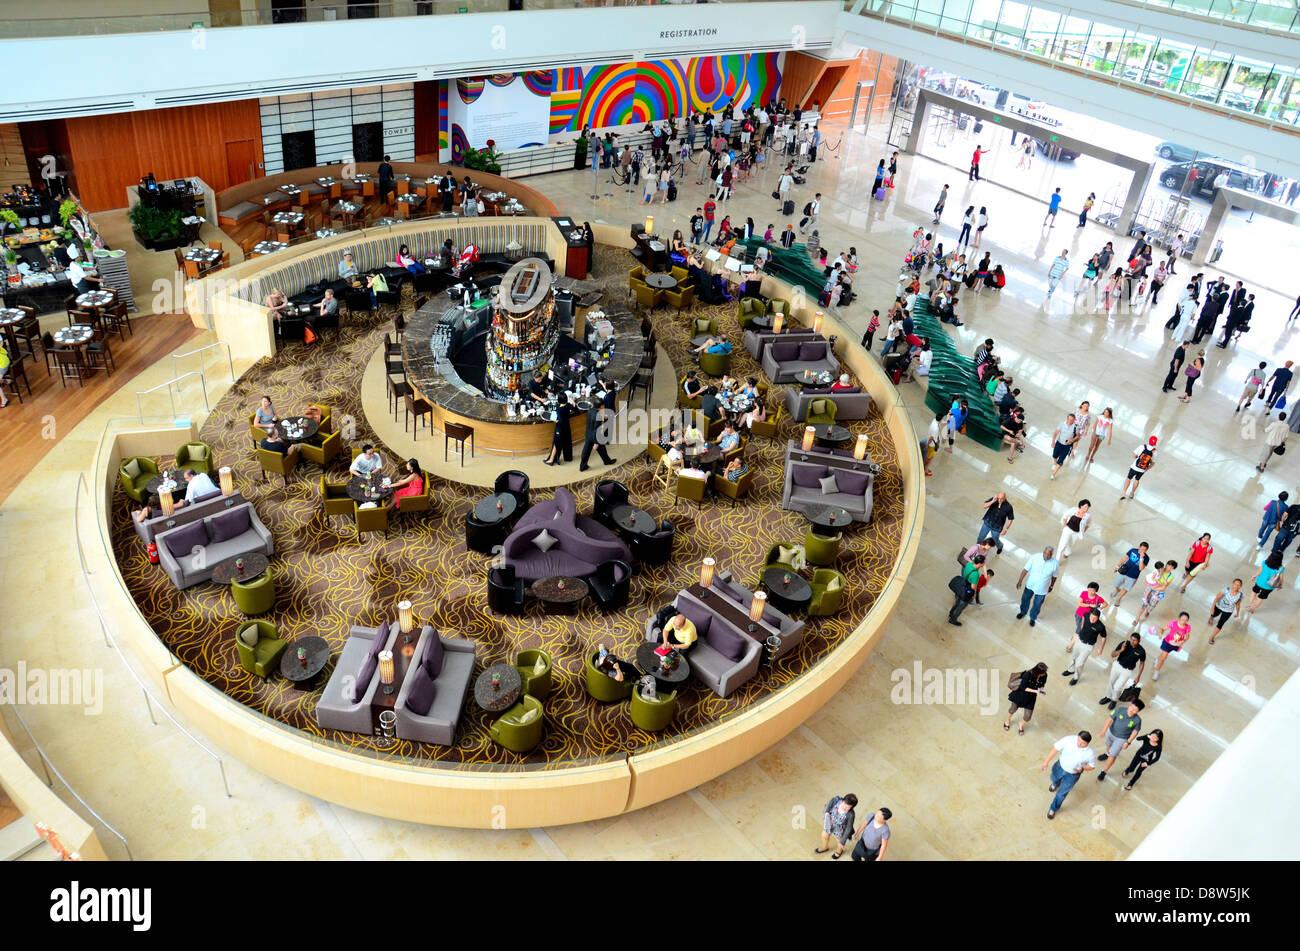 Marina Bay Sands hotel lobby: Singapore - Stock Image